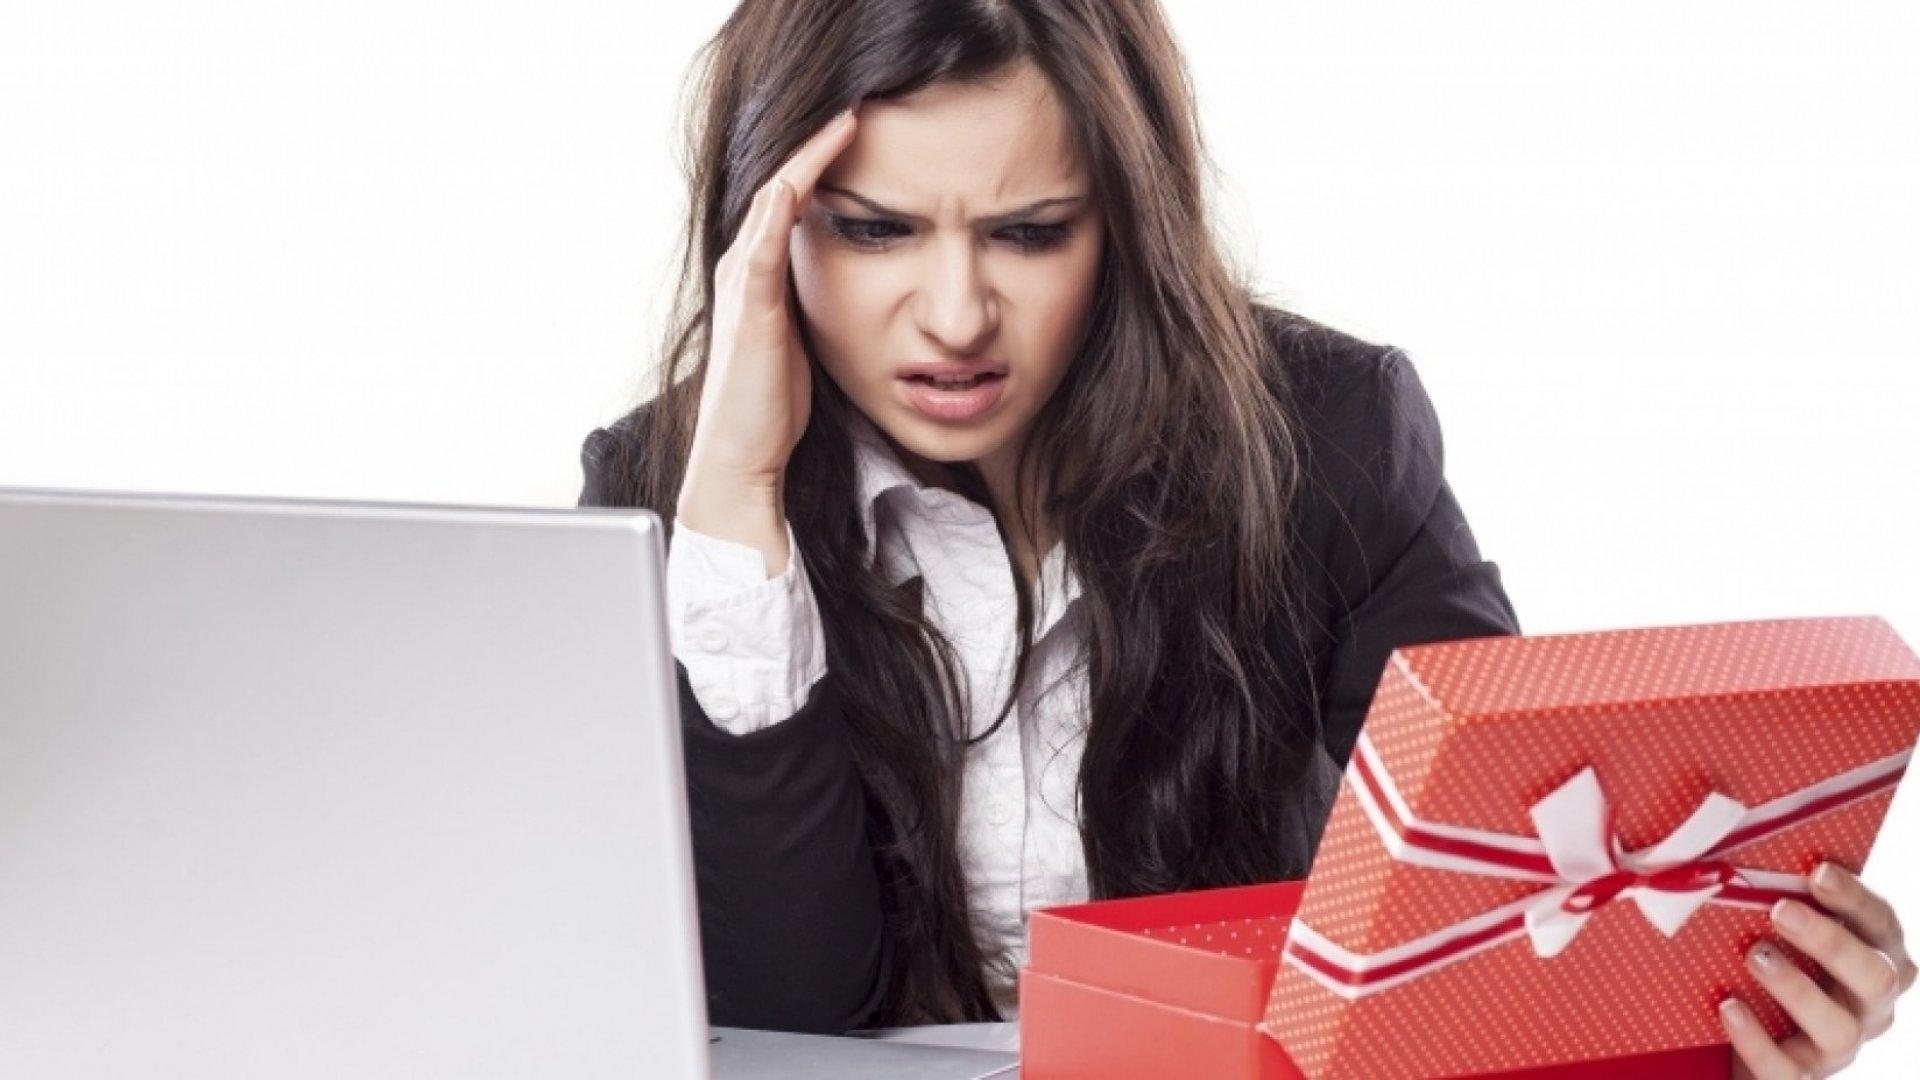 3 Reasons Why One Company's $70,000 Minimum Wage Hurt Everyone Who Got it